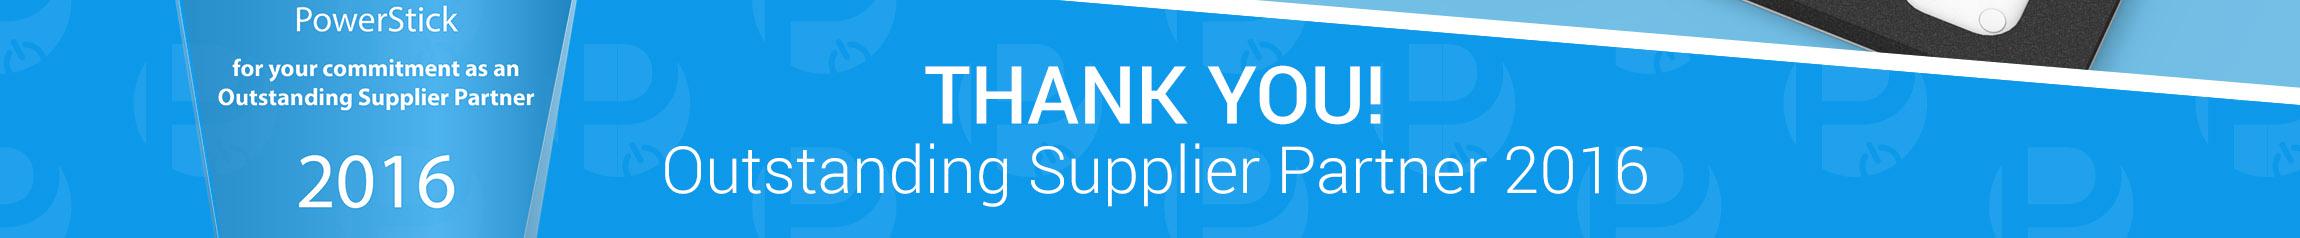 Outstanding Supplier Partner 2016